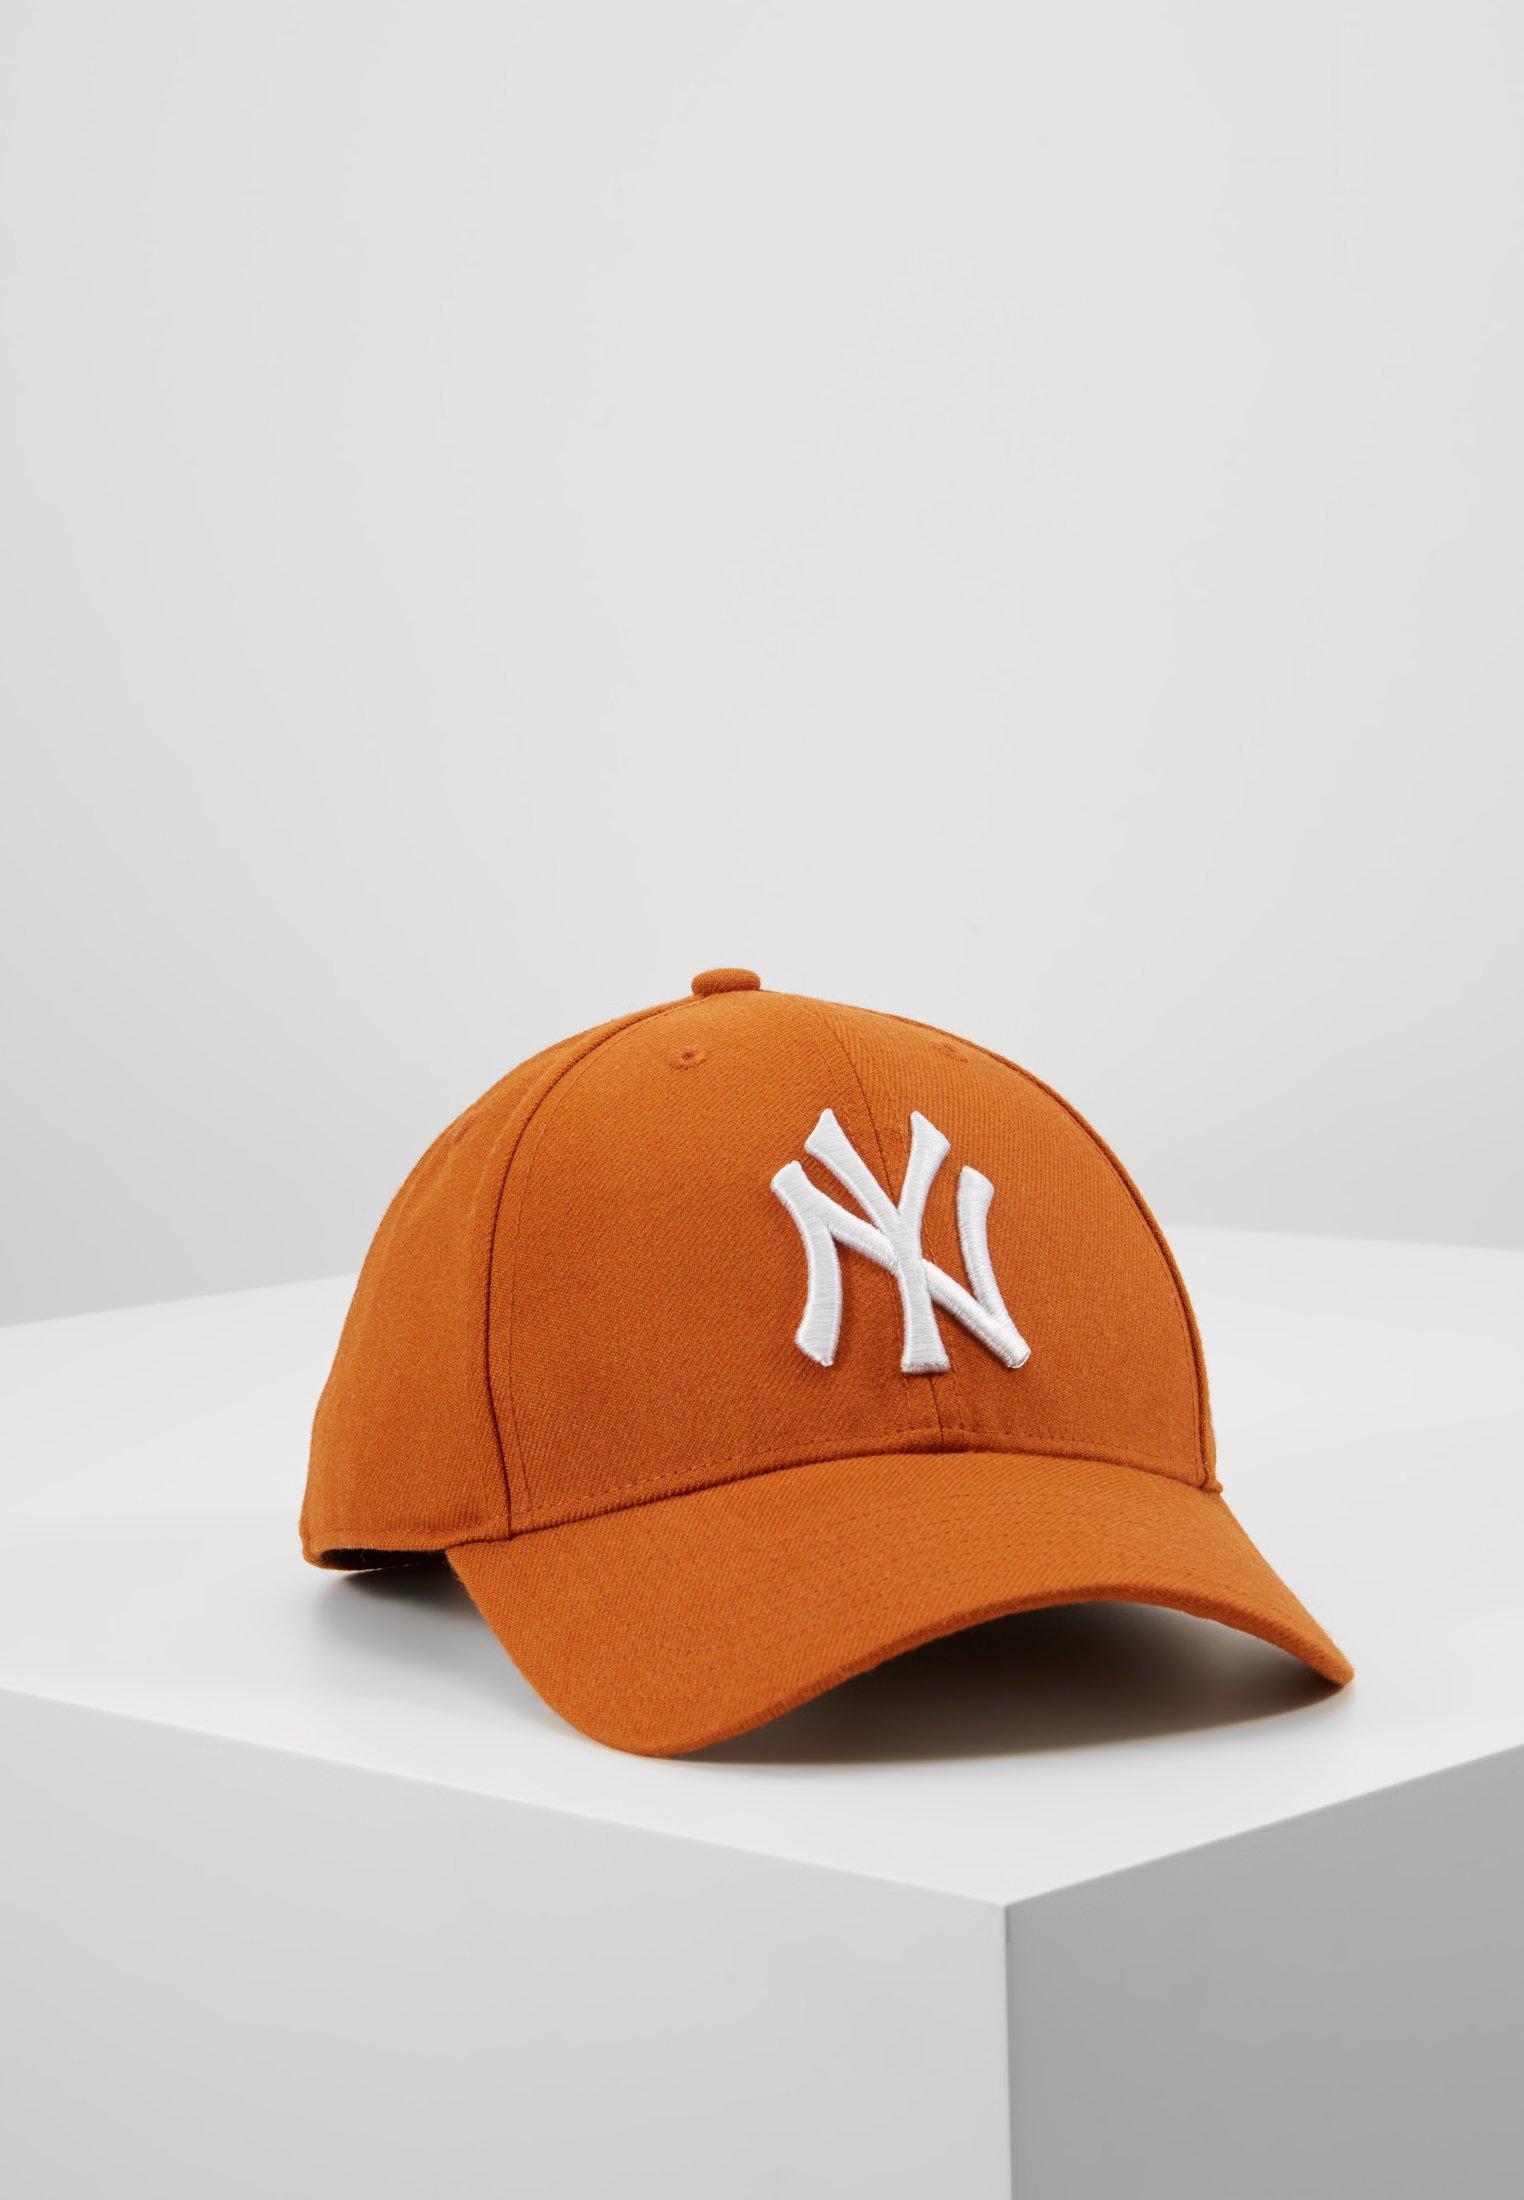 Hombre MLB NEW YORK YANKEES '47 SNAPBACK UNISEX - Gorra